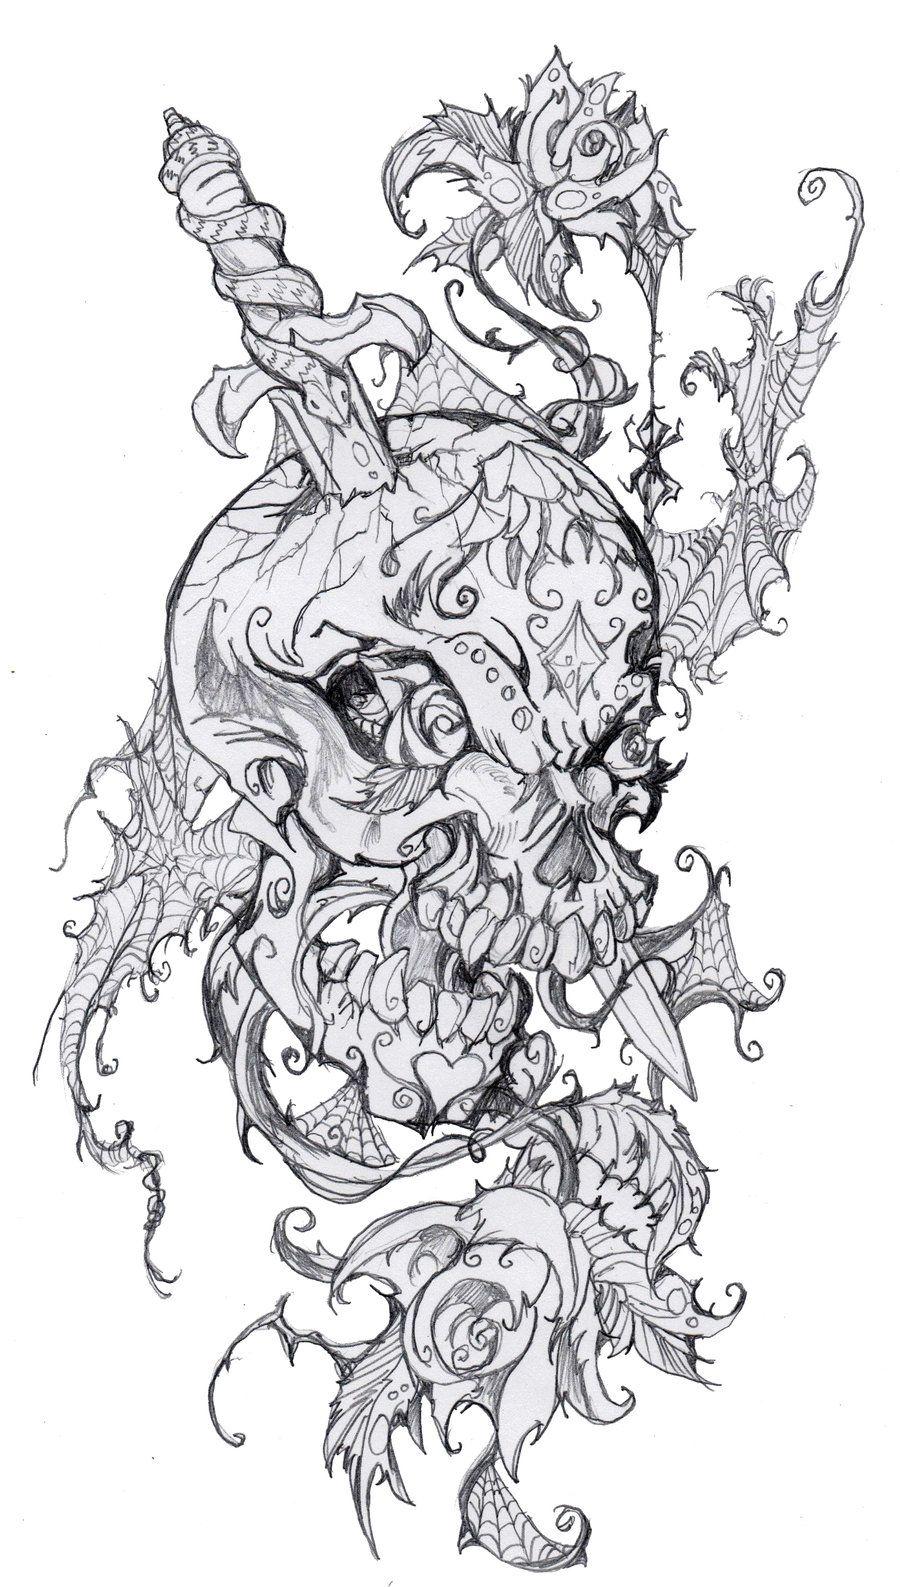 Sugar Skull Tattoo Design by mosttalented-onearth